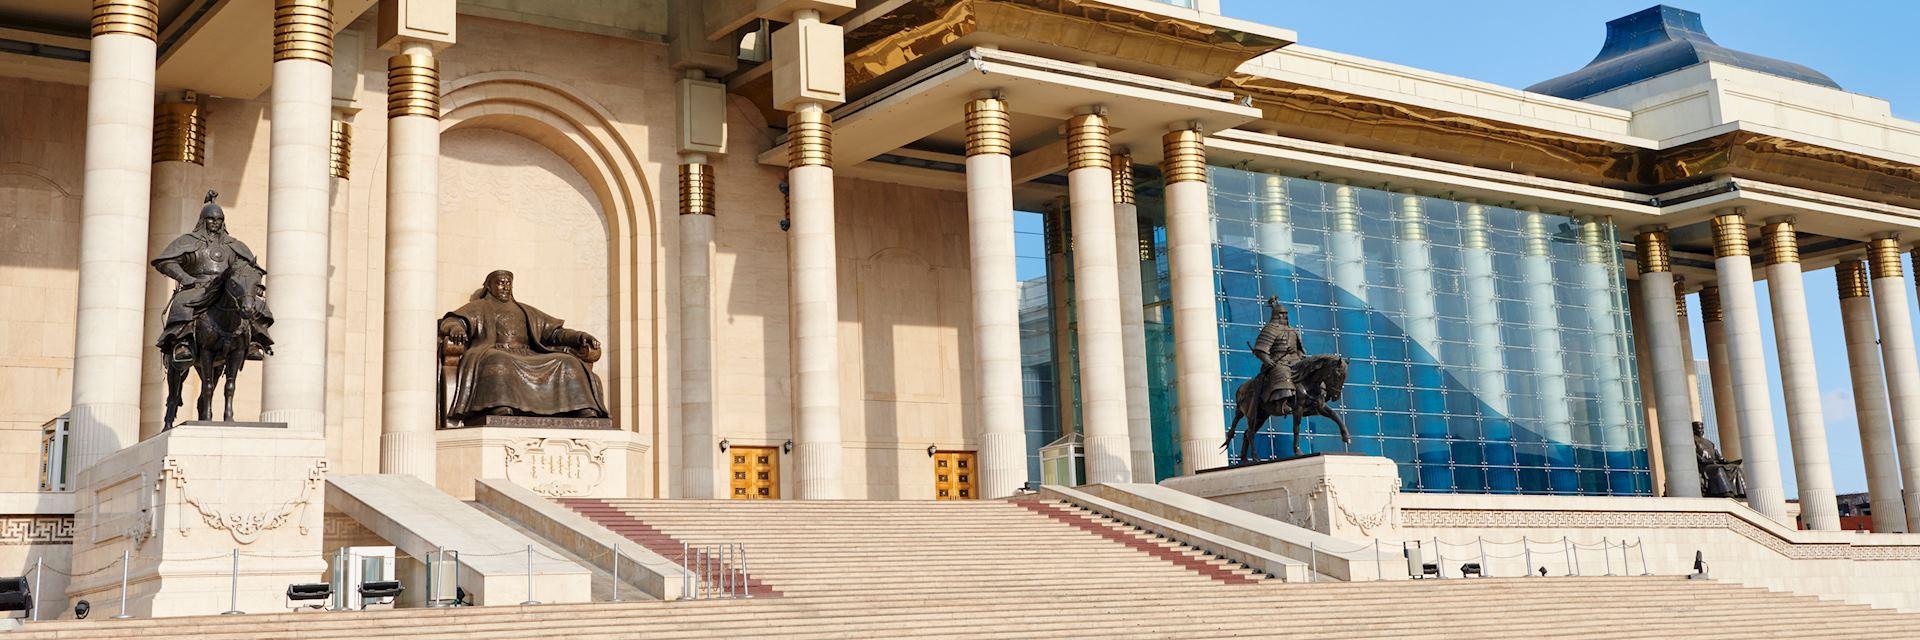 Parliament Building, Ulaan Baatar